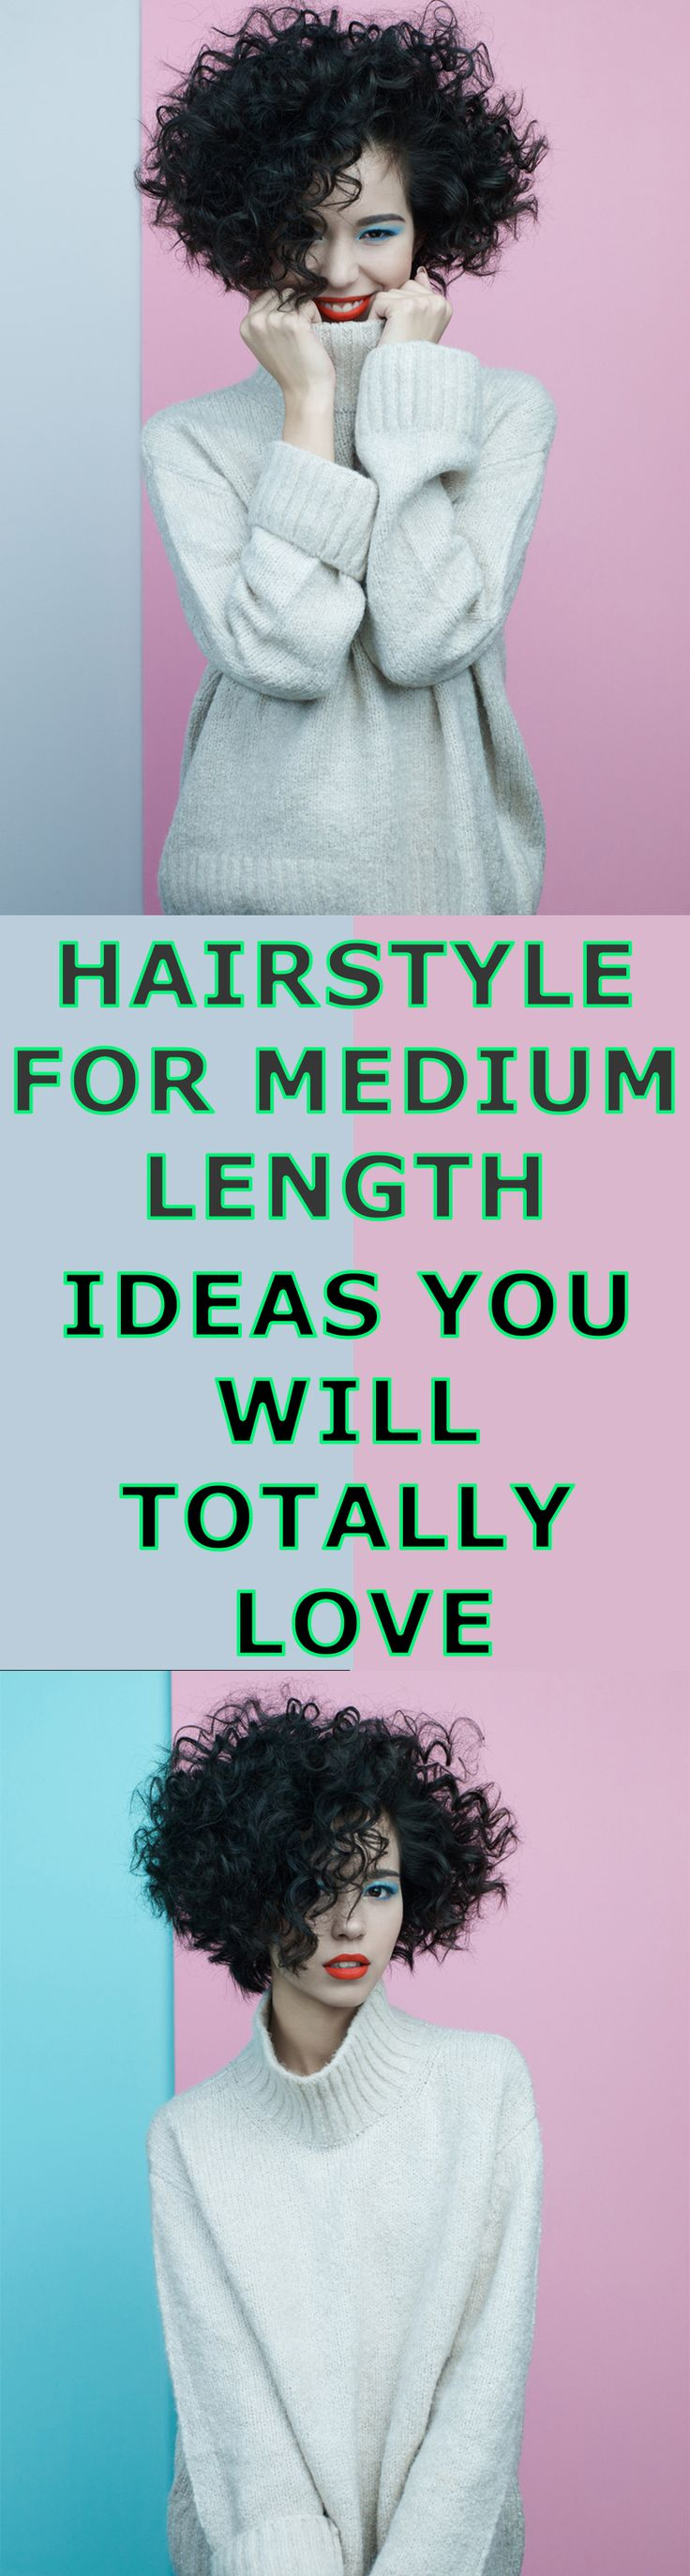 Hairstyle For Medium Length